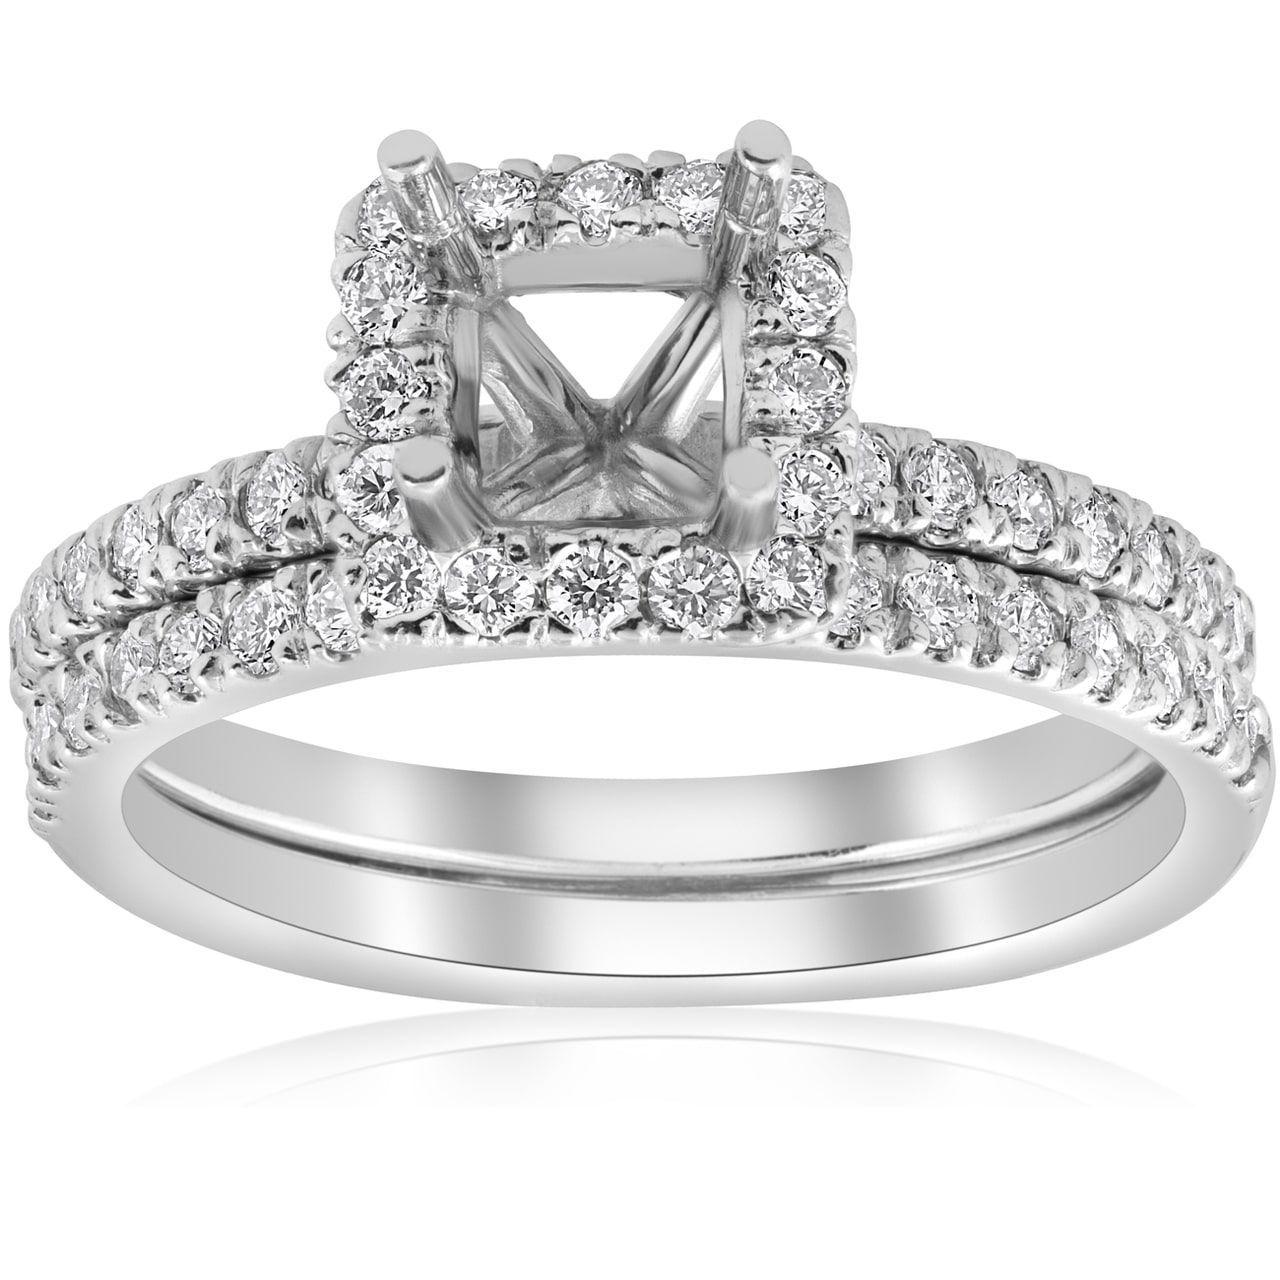 Bliss 14k Gold 5/8ct Princess Cut Diamond Halo Engagement Ring Setting Matching Band